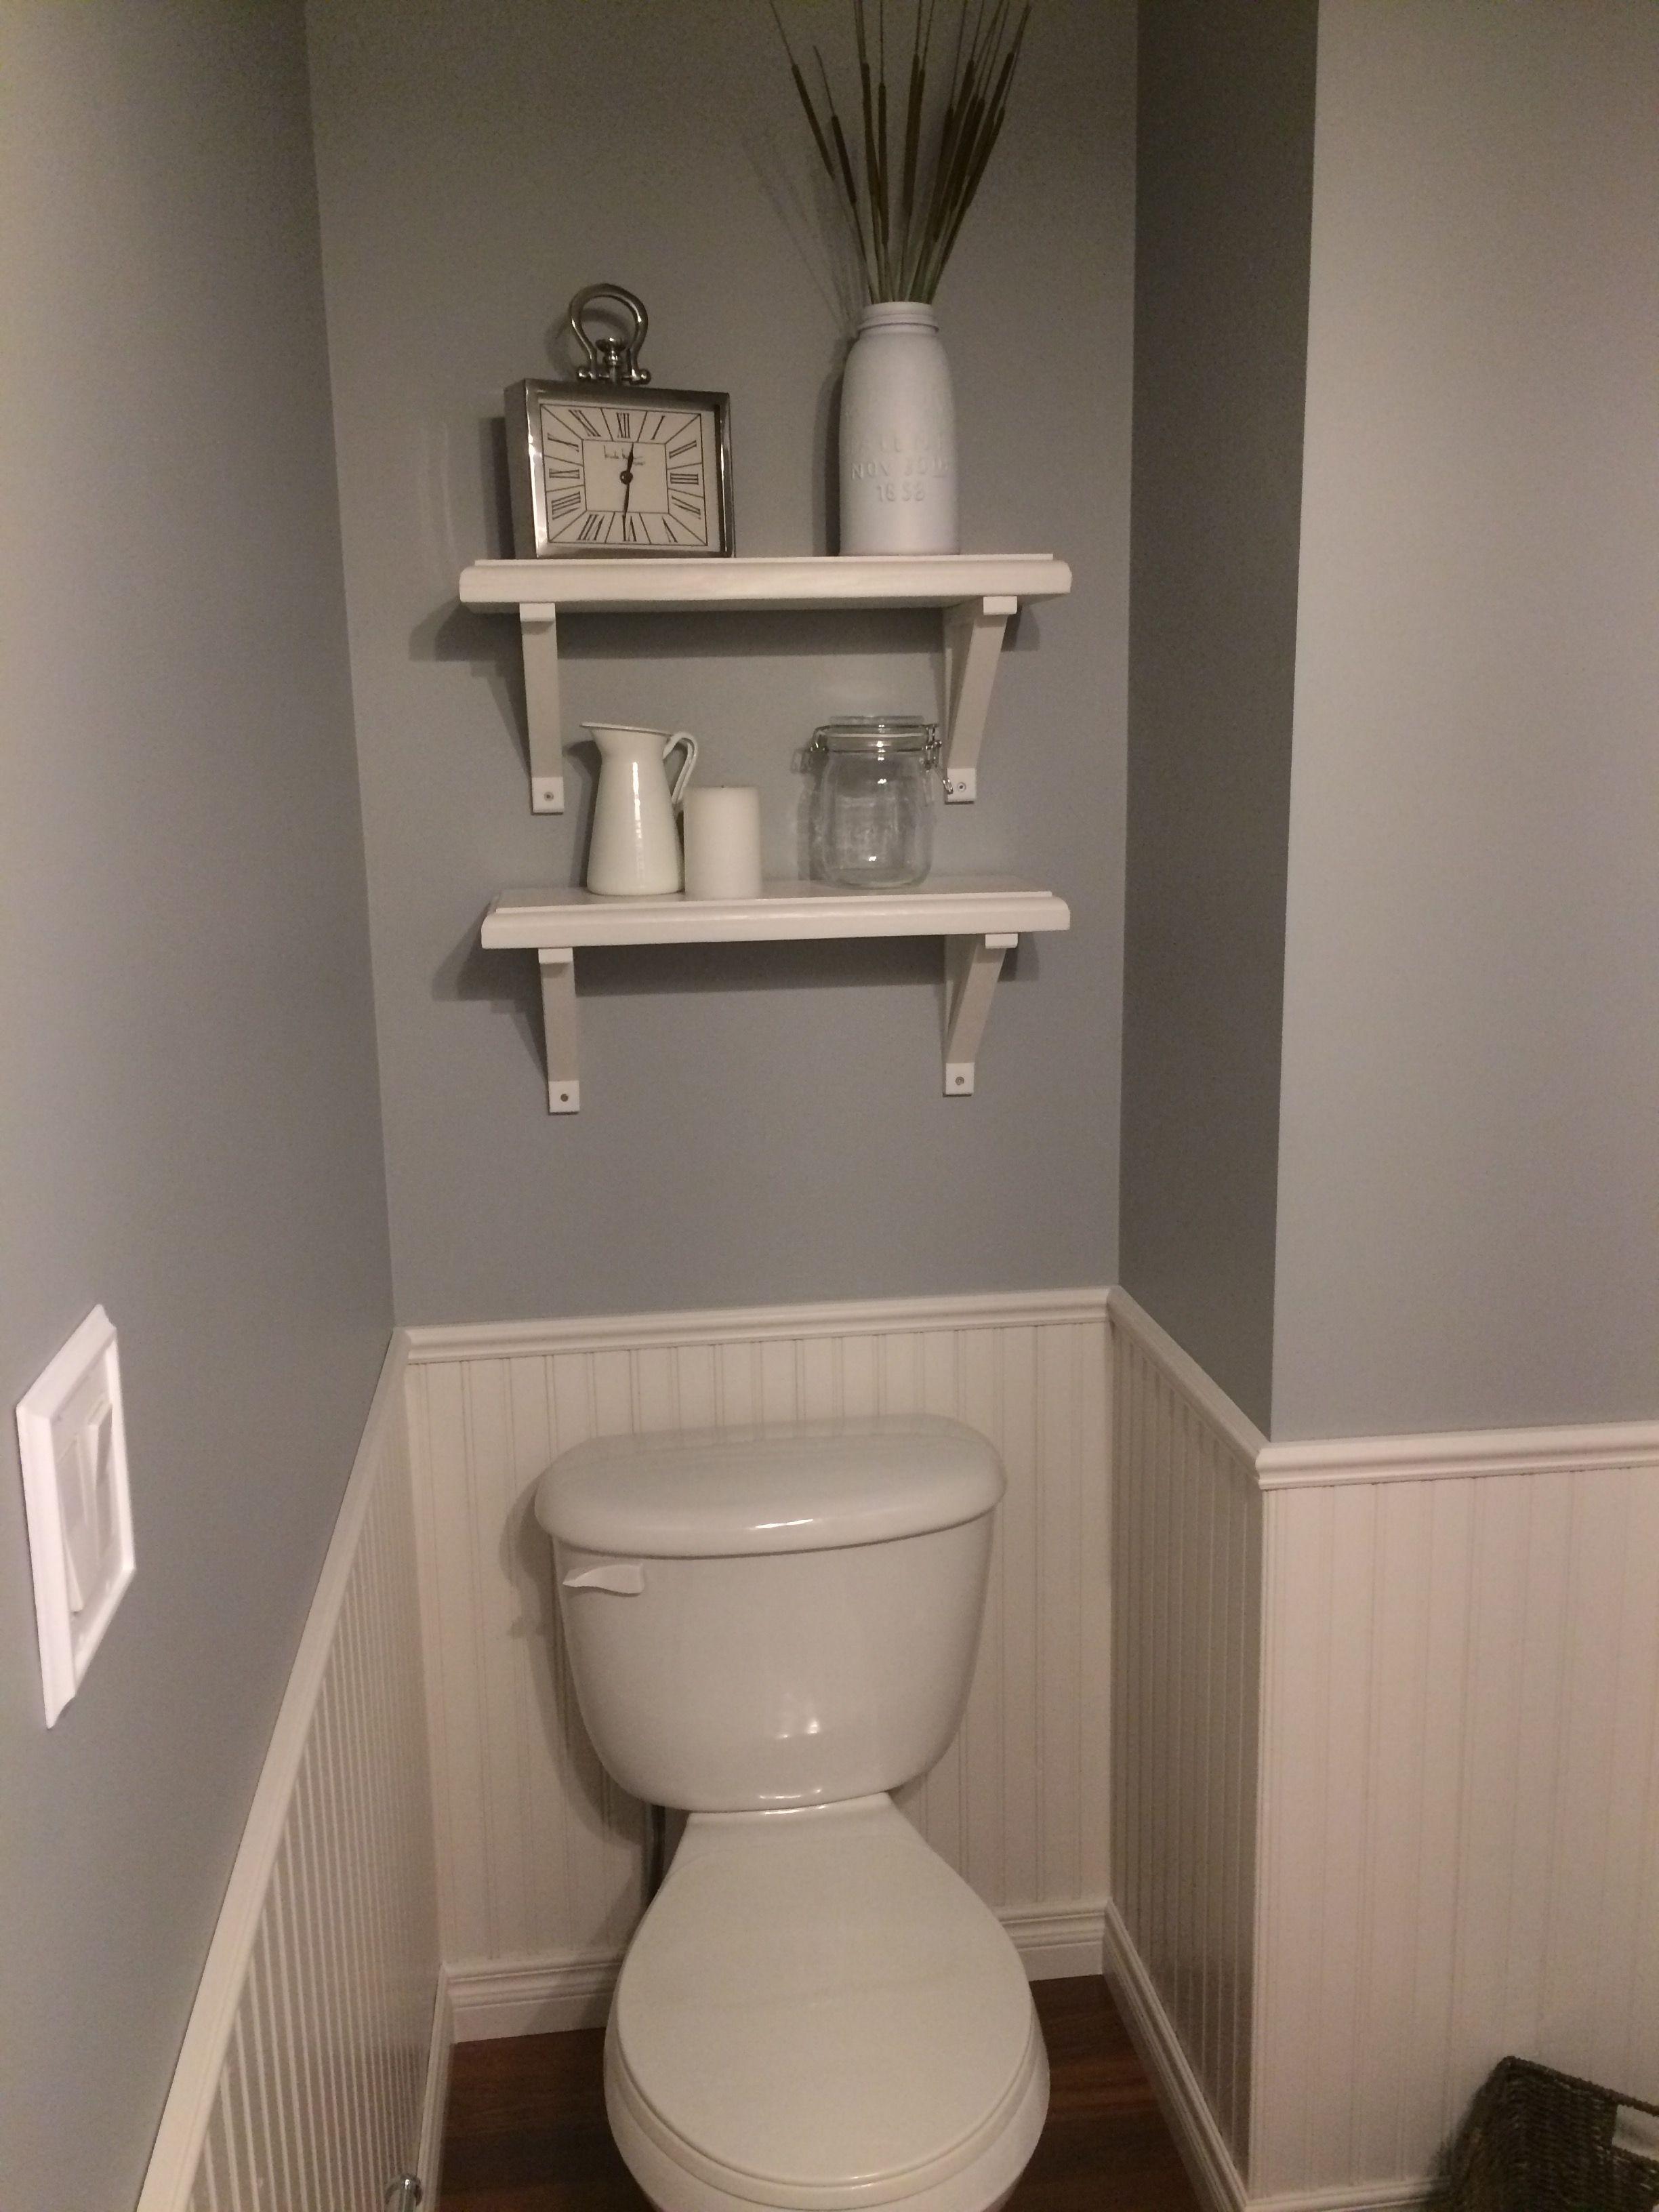 Farmhouse bathroom shelves in white and gray bathroom